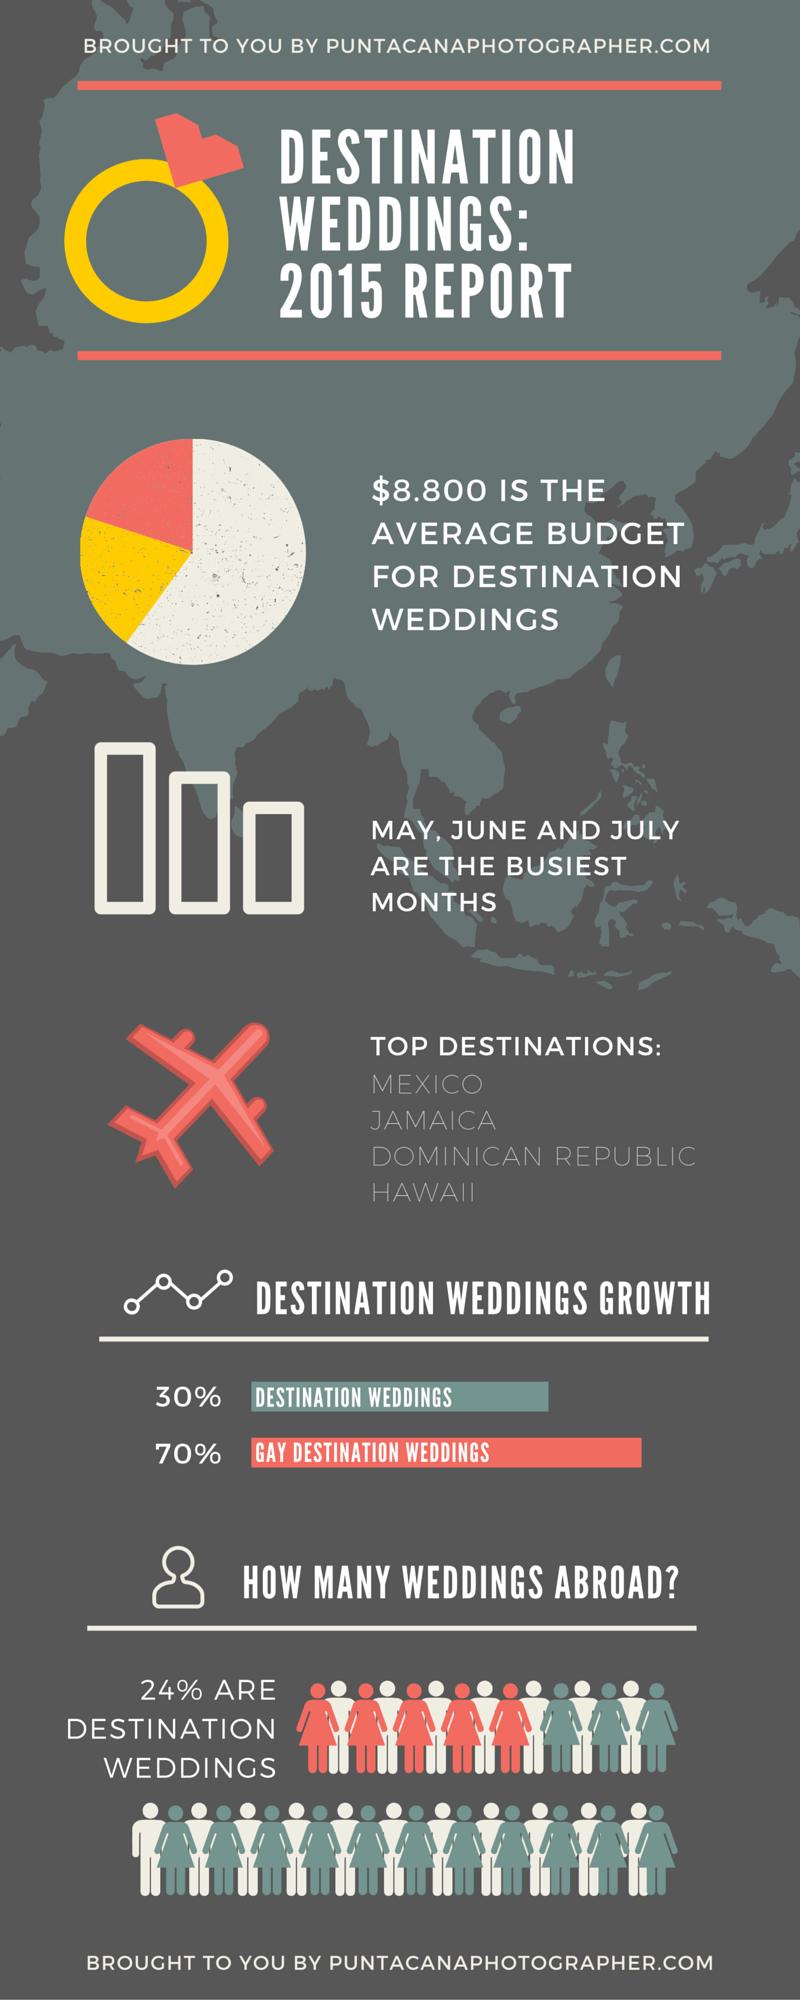 Destination Weddings Report 2015 by Punta Cana Photographer